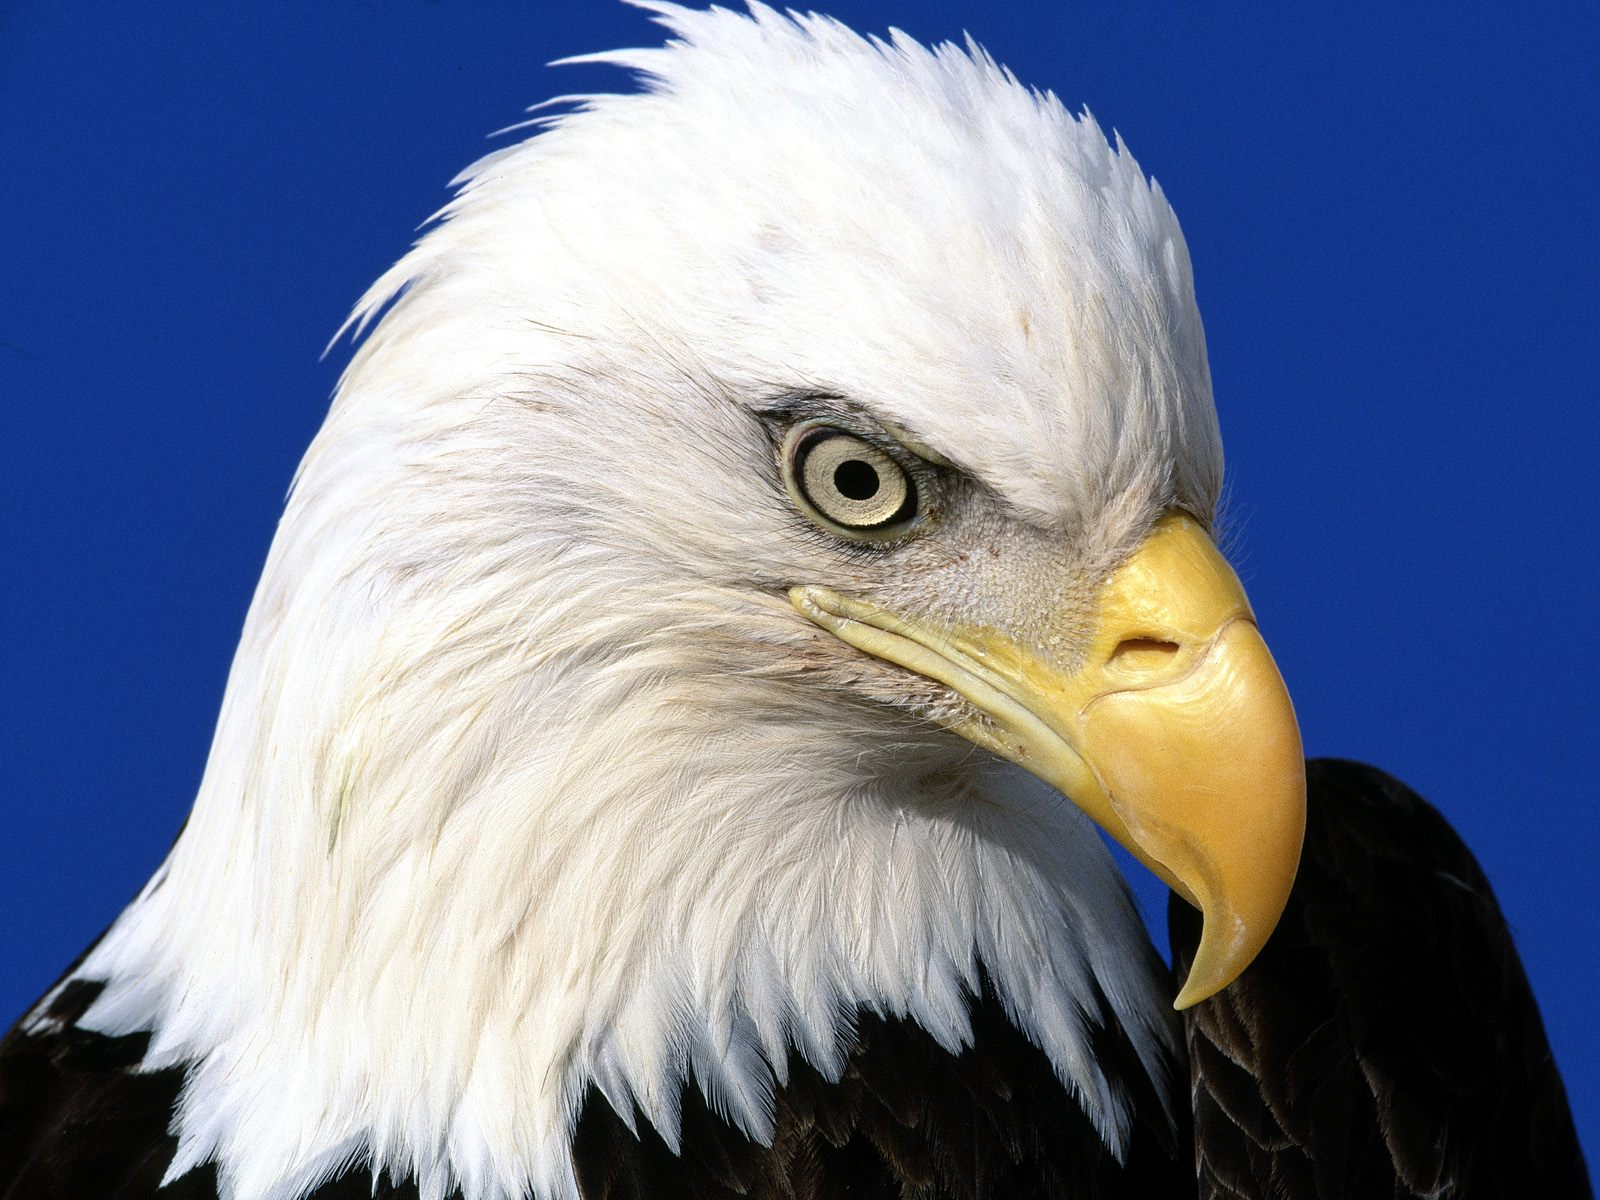 http://1.bp.blogspot.com/-rFBeB0B7ztk/Tka_VEpPNdI/AAAAAAAACGs/OJPuml7Vii4/s1600/noble-lead-bald-eagle-pictures.jpg